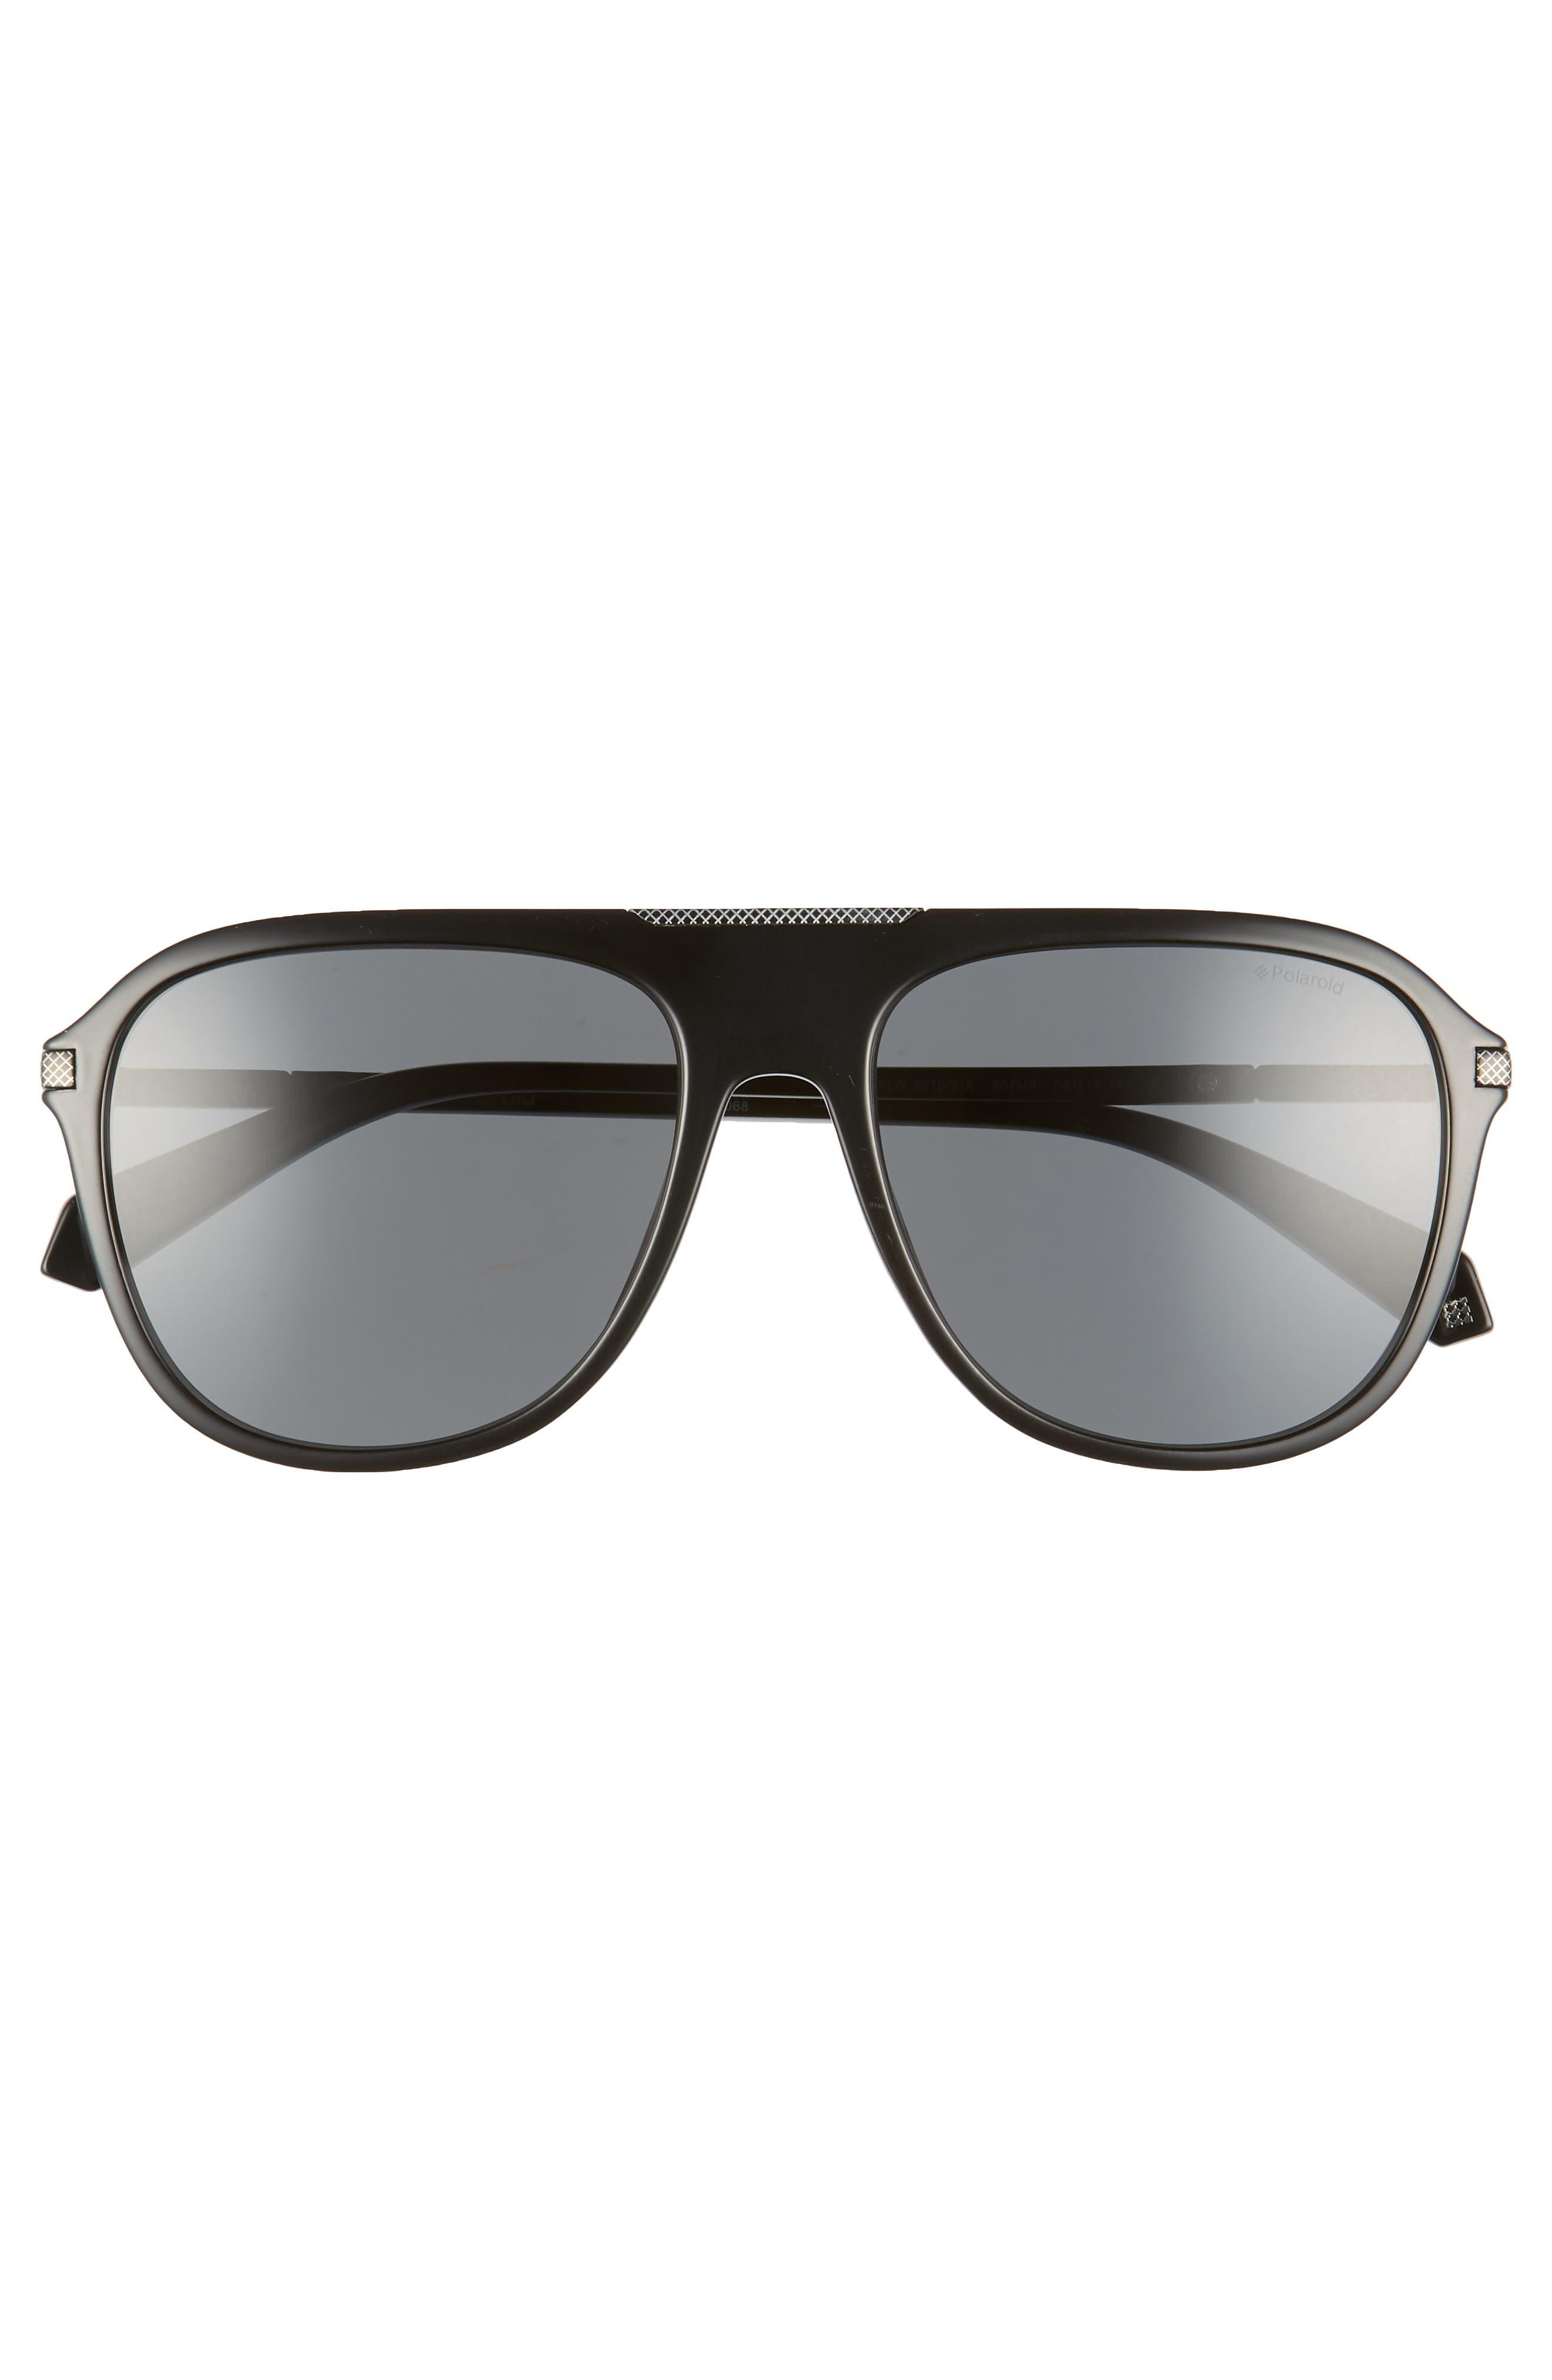 58mm Polarized Aviator Sunglasses,                             Alternate thumbnail 2, color,                             BLACK